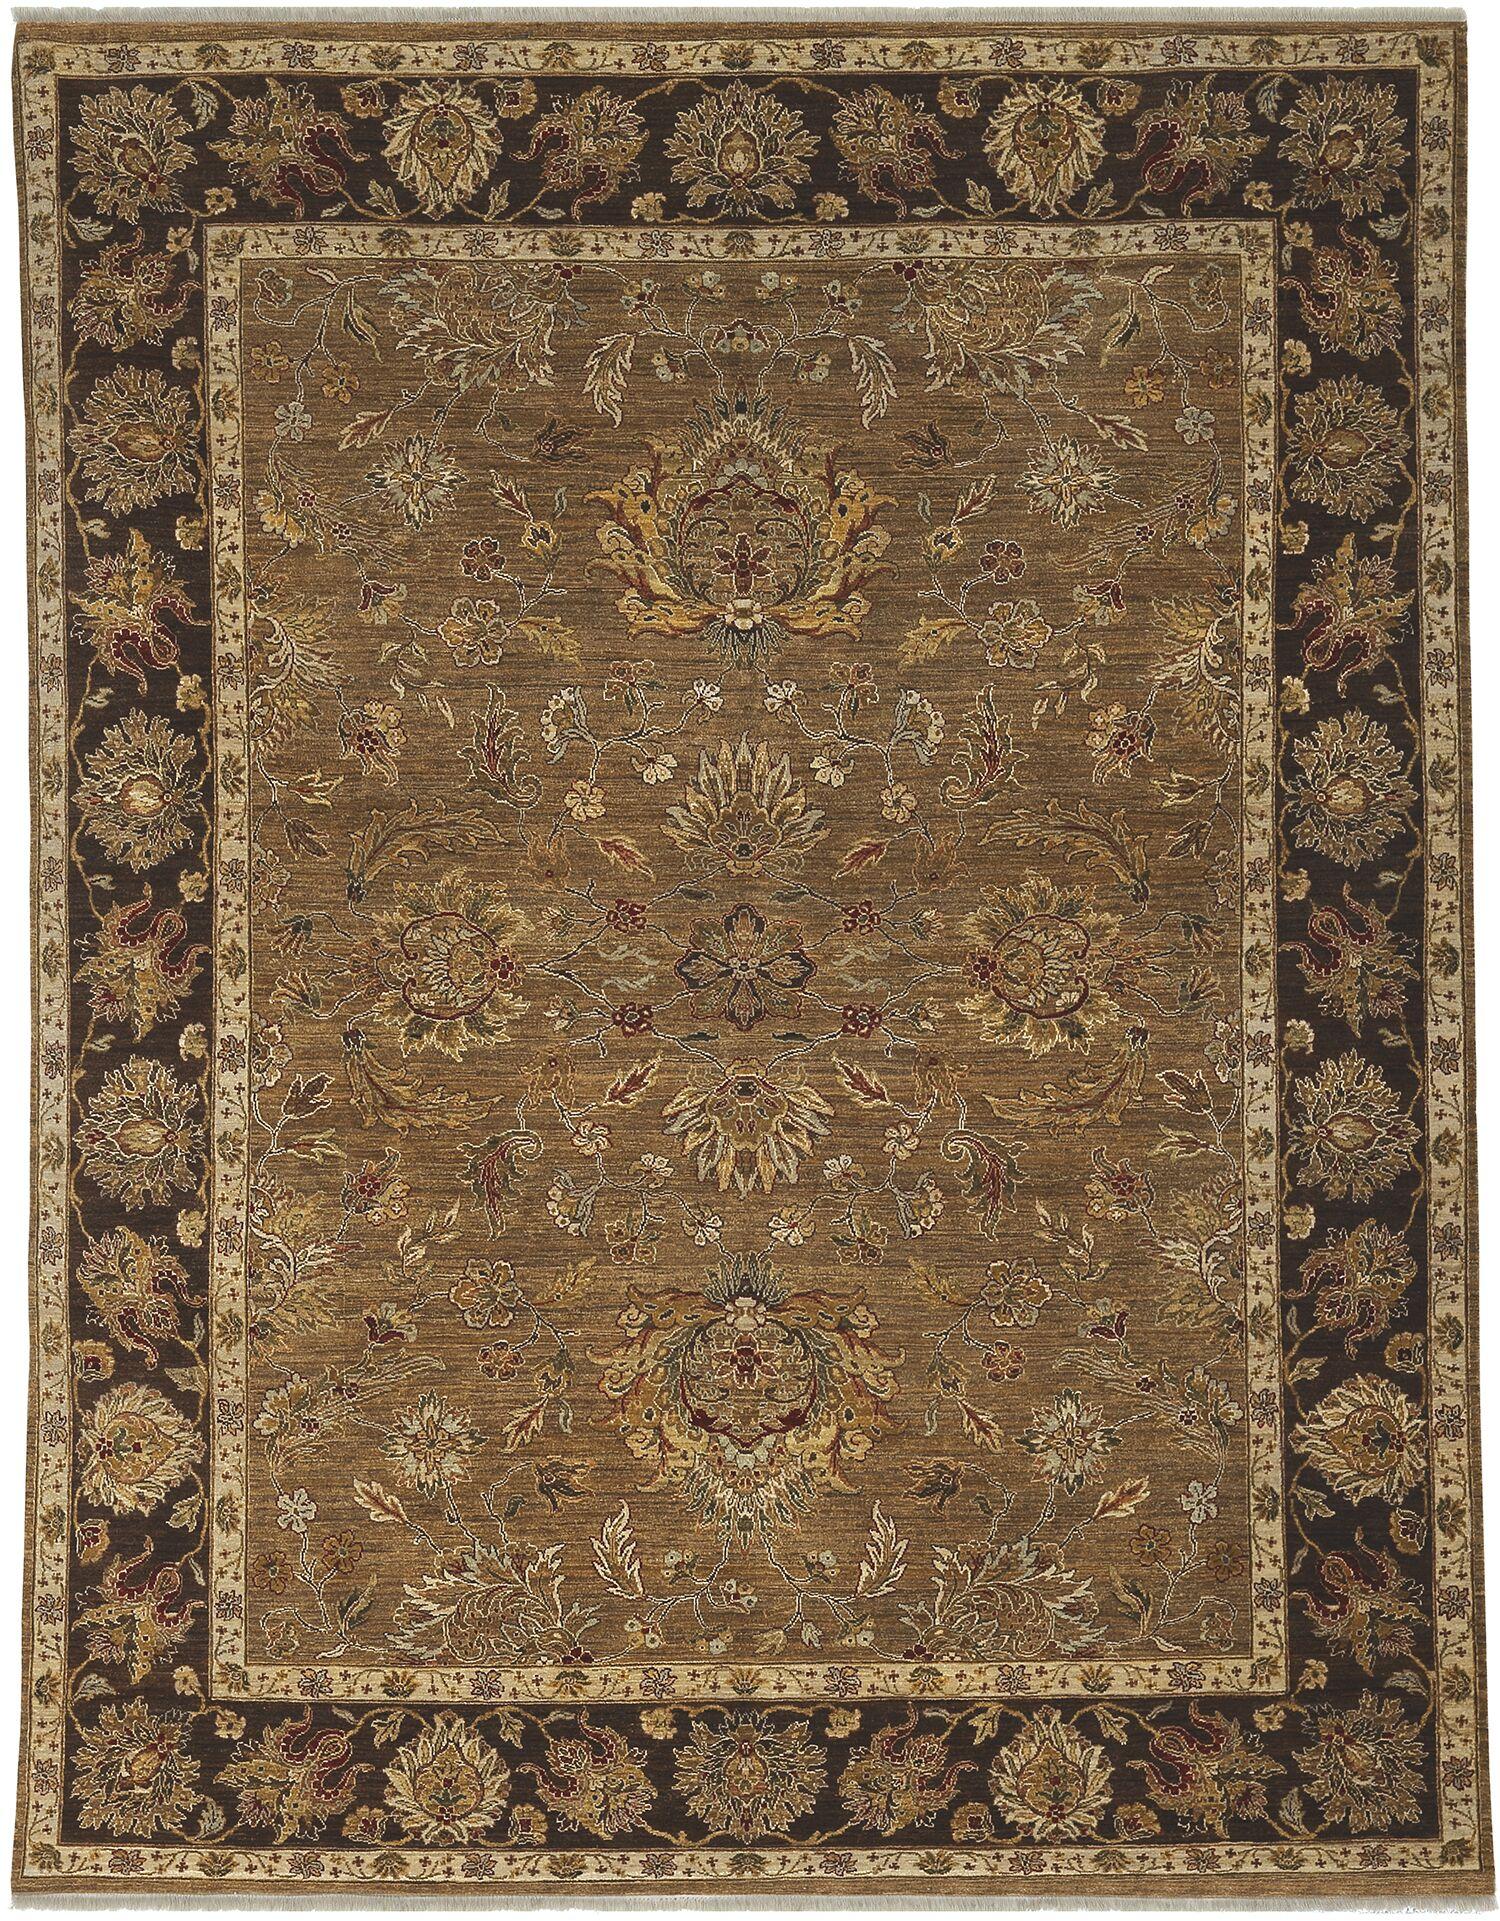 Lidiaídia Oak/Dark Tan Area Rug Rug Size: 12' x 15'